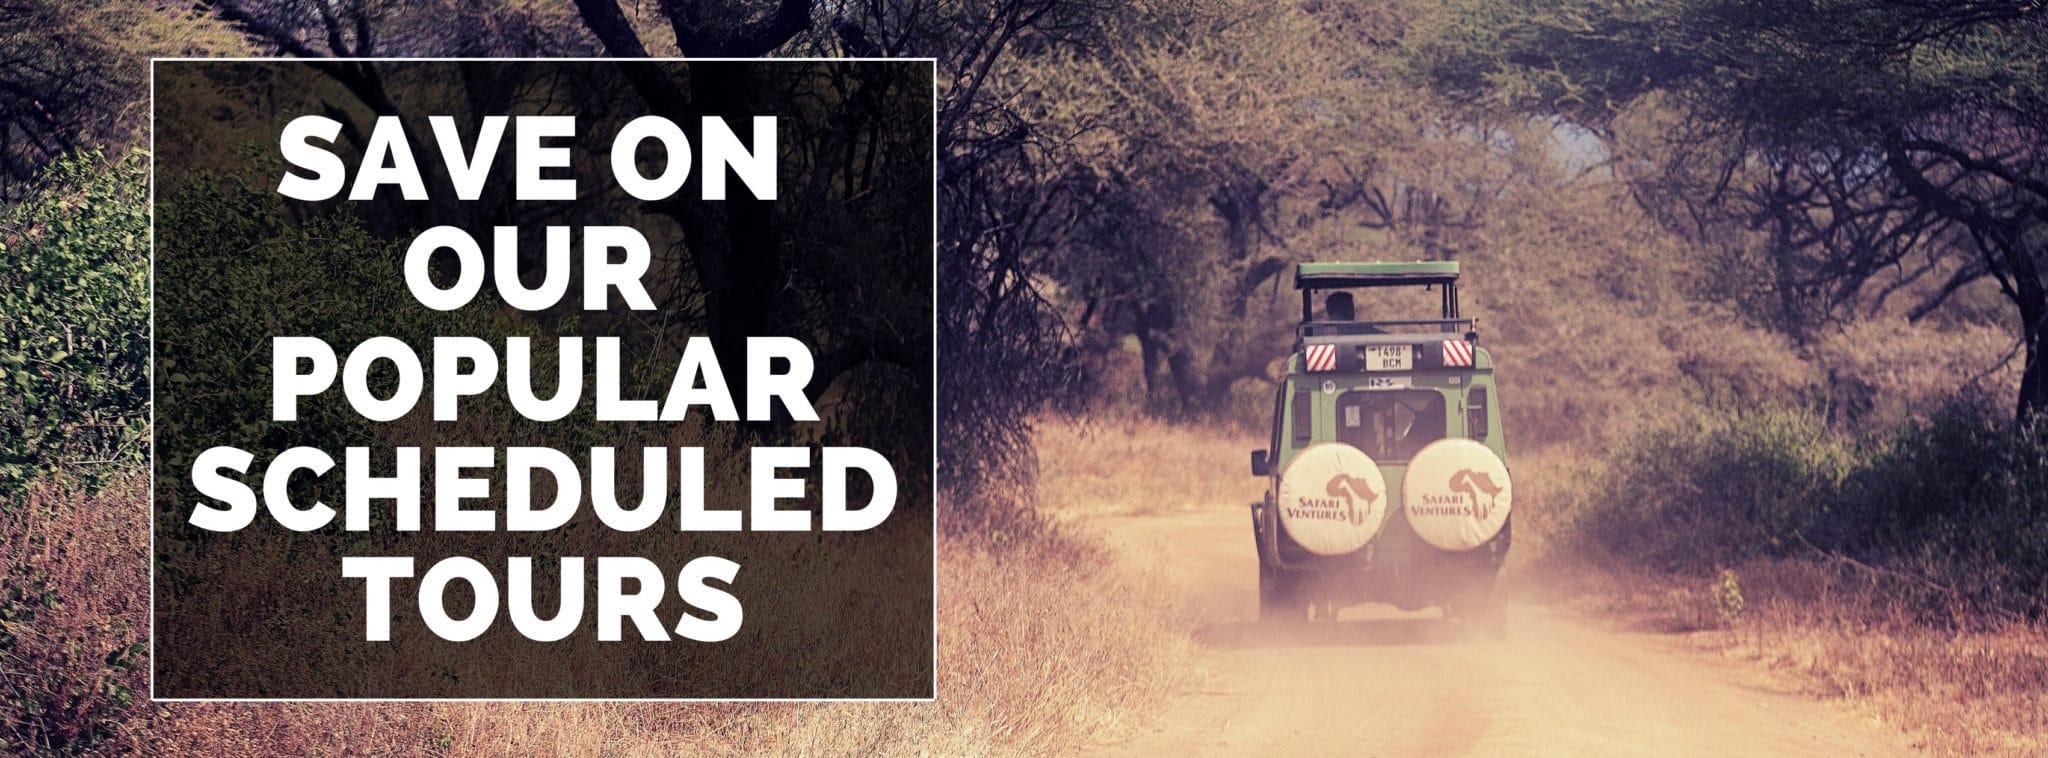 https://www.safariventures.com/wp-content/uploads/Website-offer-header-1.0-scaled.jpg